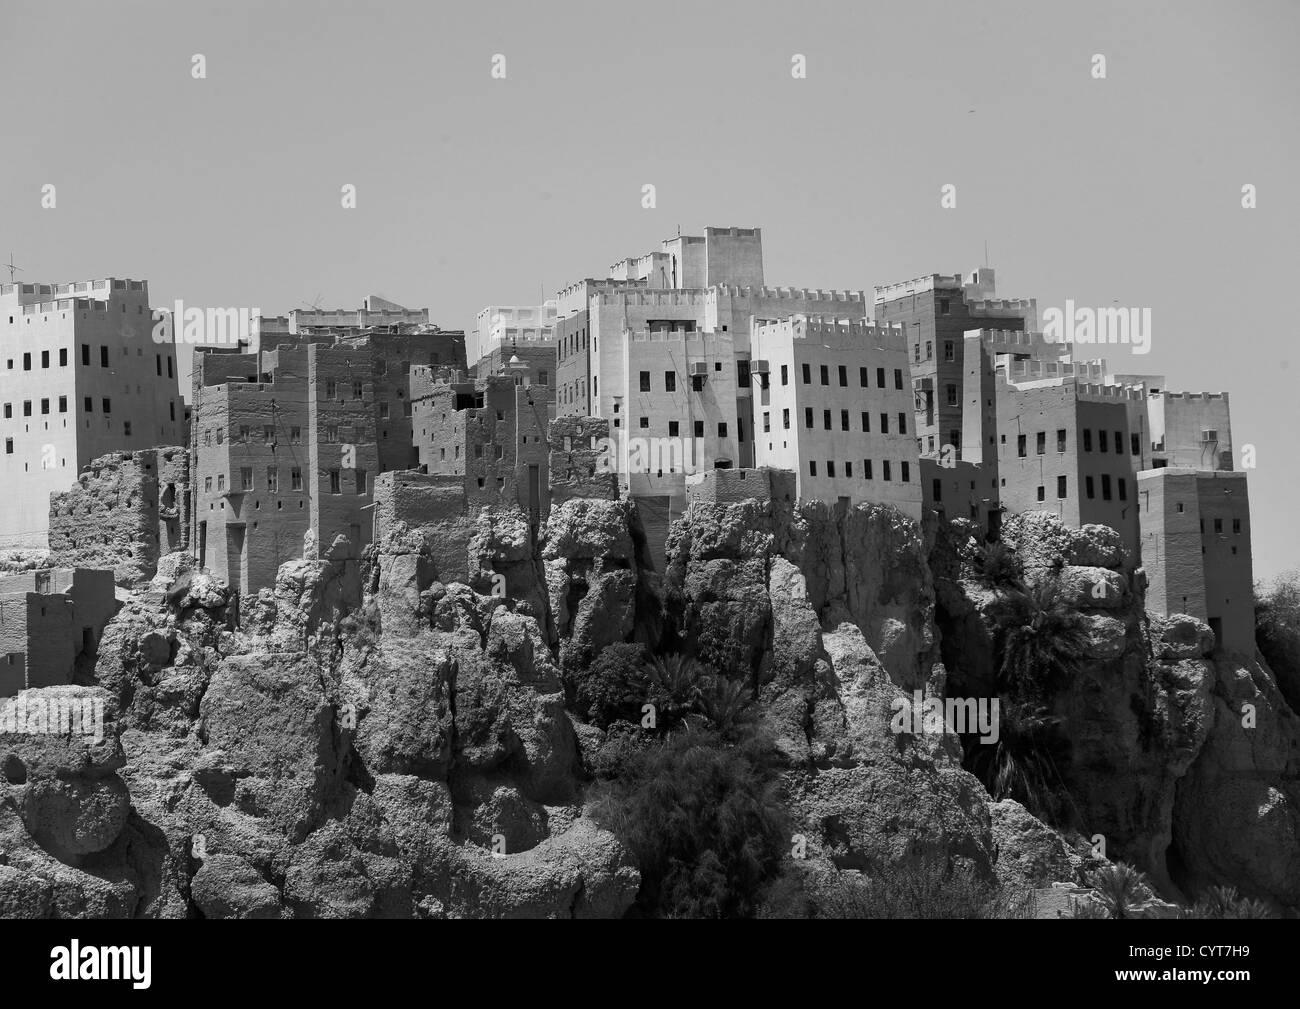 Adobe And Painted Buildings, Al Hajjarin Village,, Wadi Doan, Yemen - Stock Image